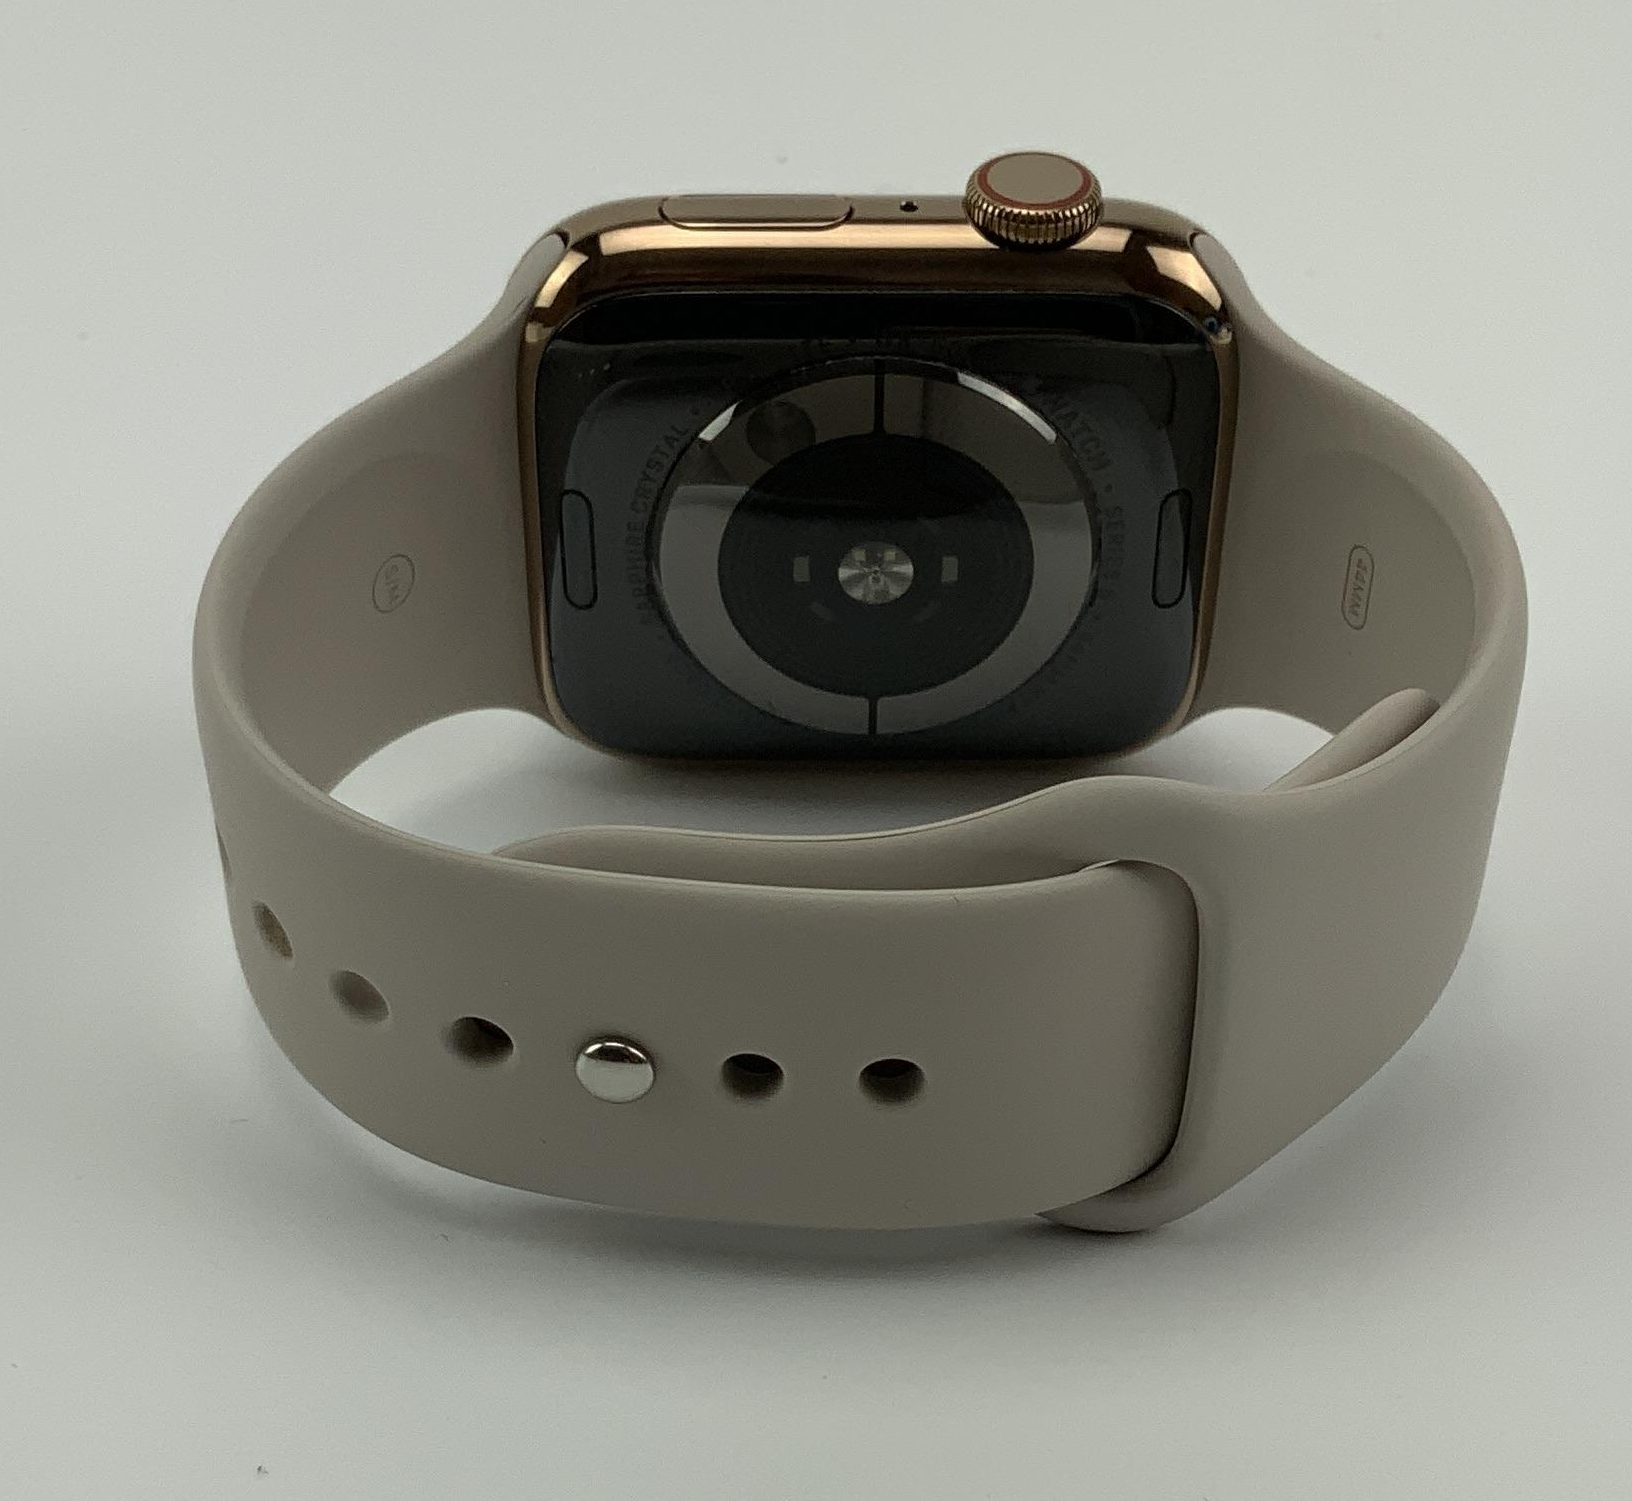 Watch Series 5 Steel Cellular (44mm), Gold, imagen 3